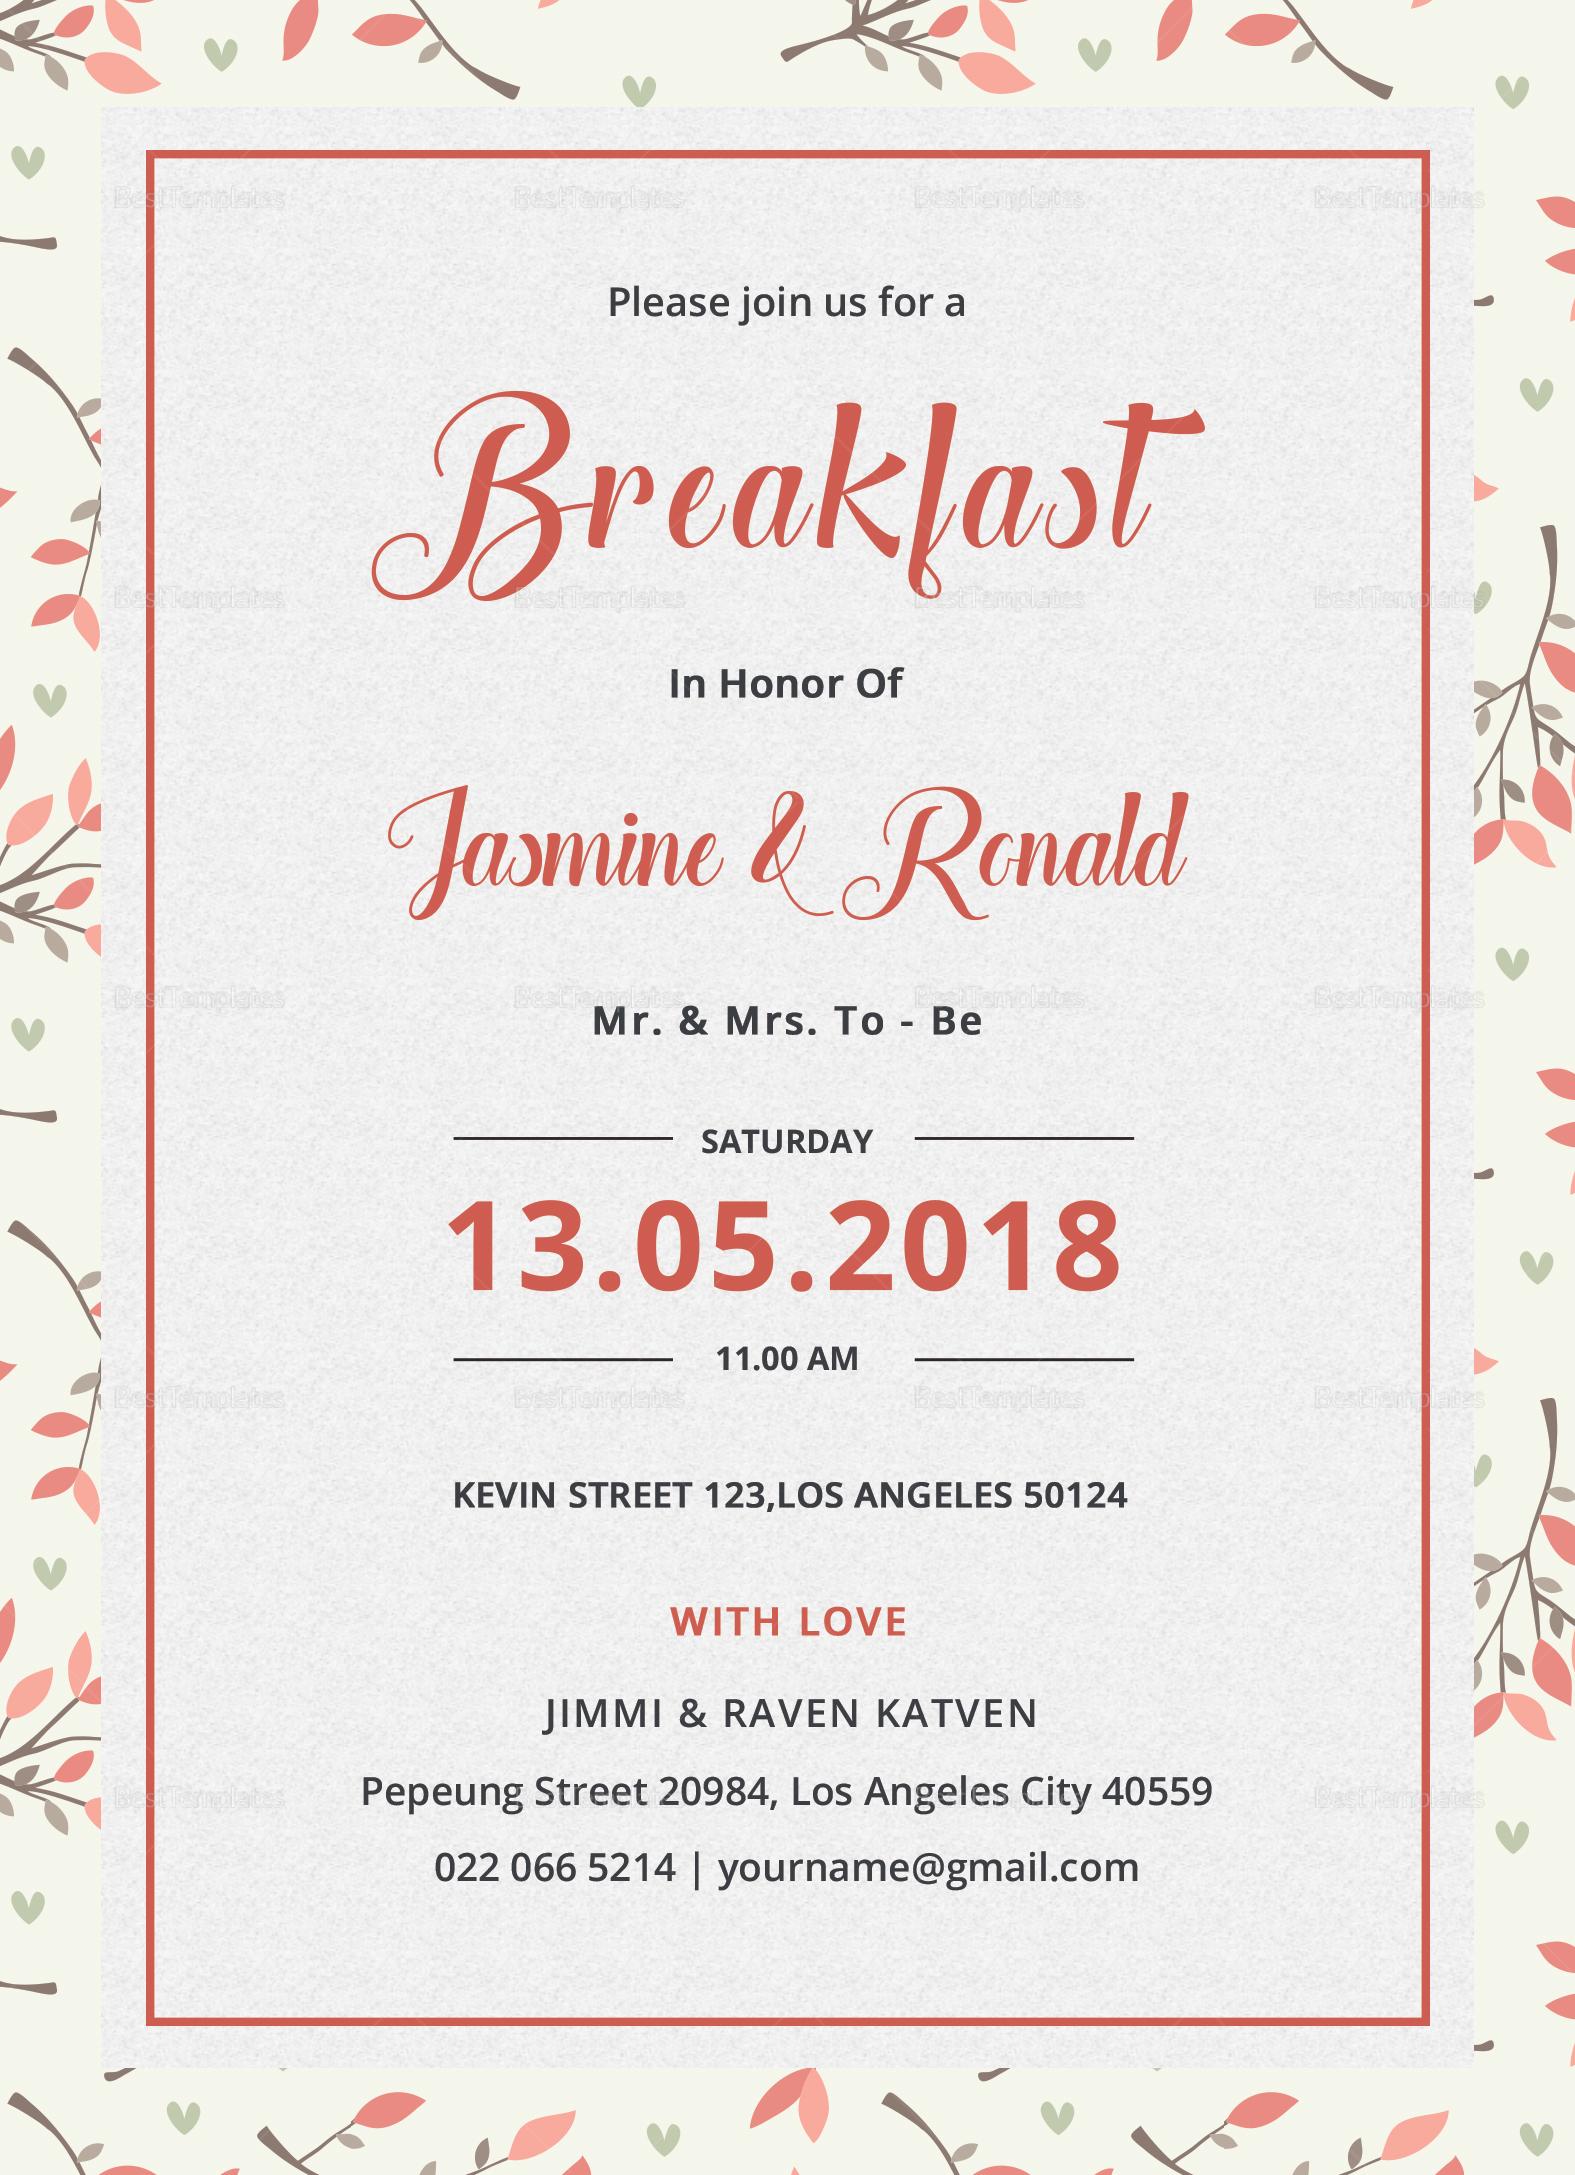 Breakfast Invitation Design